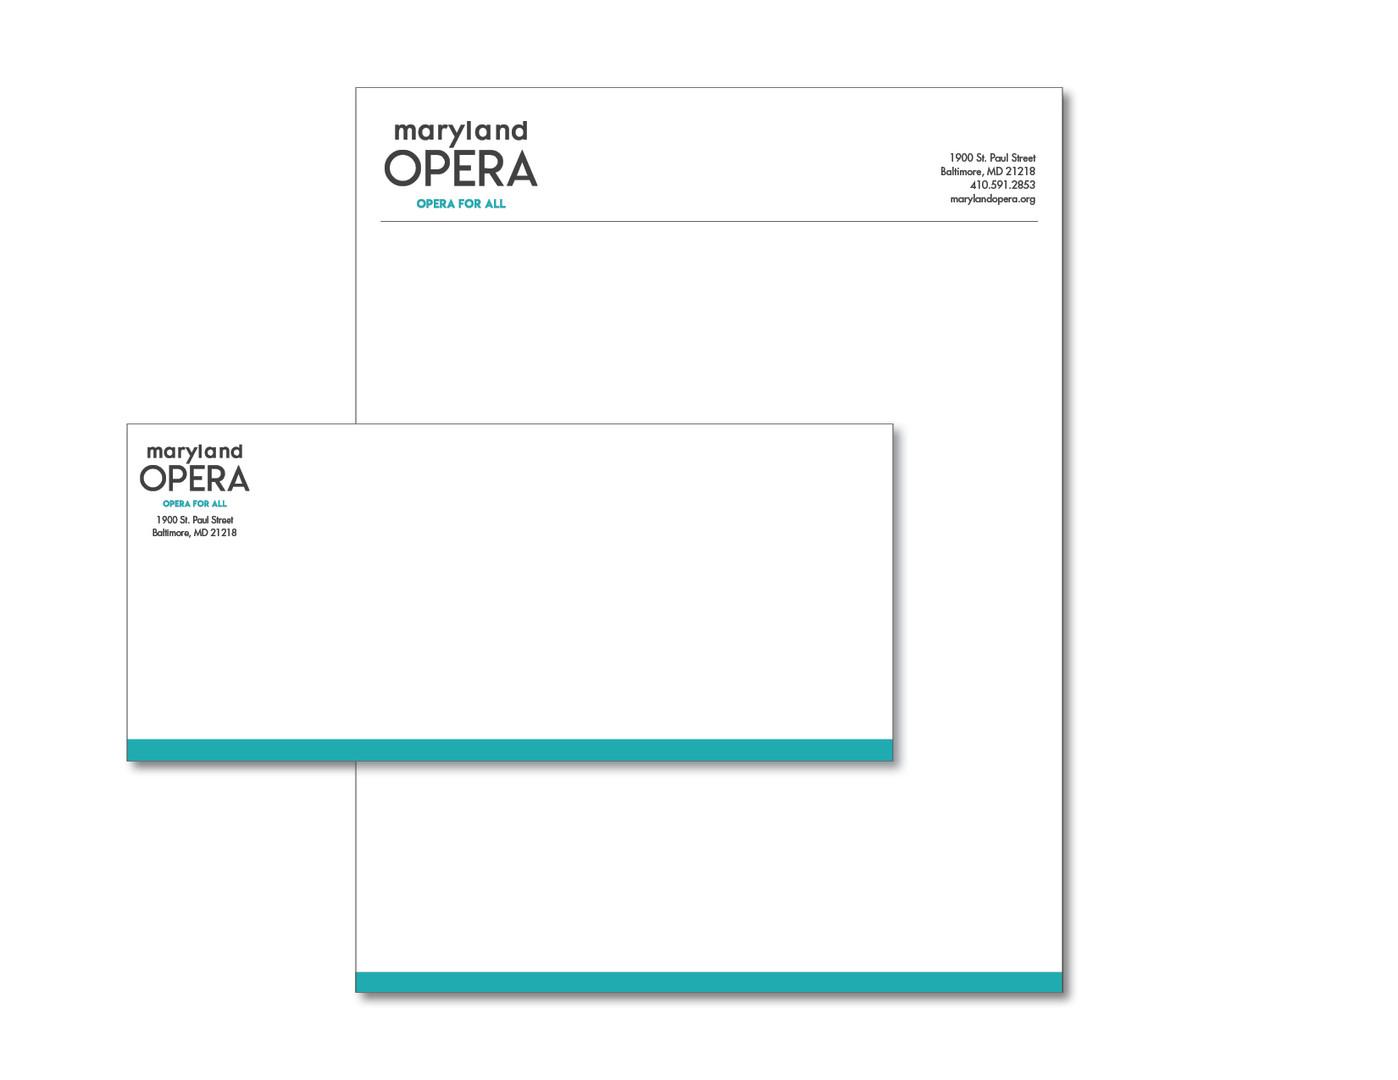 Maryland Opera Fundraising